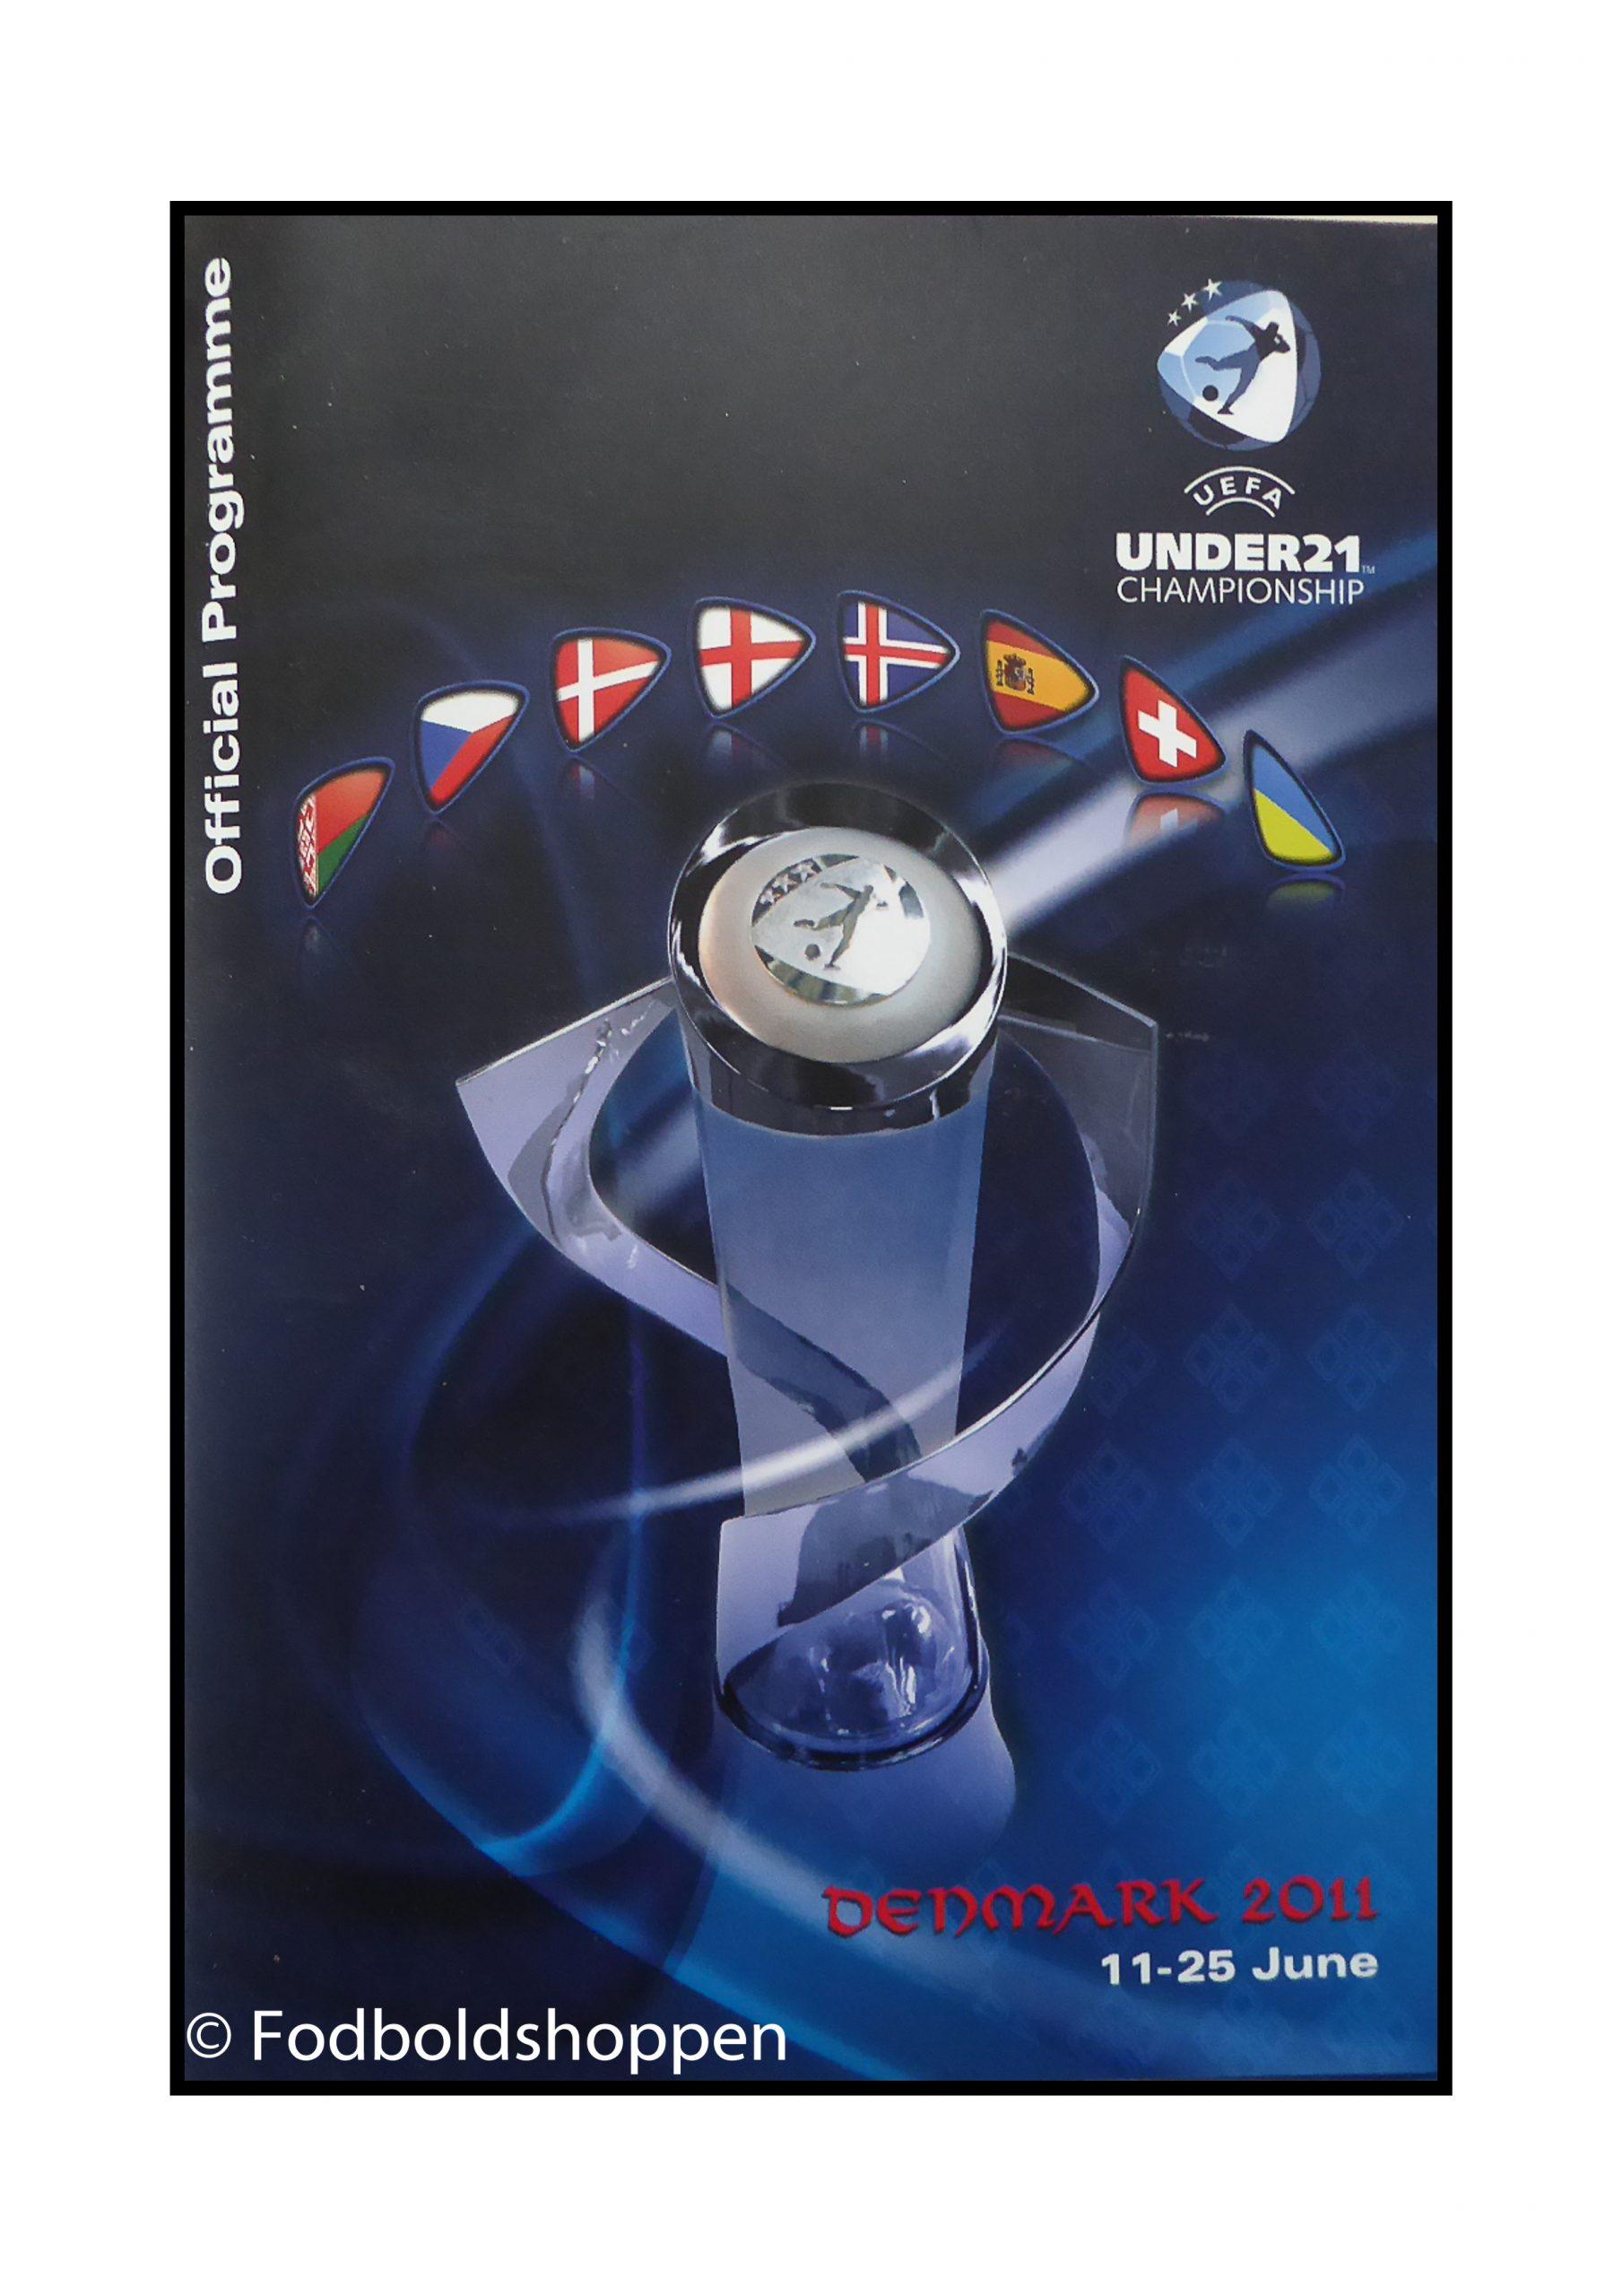 Officielt kampprogram for U21 slutrunden 2011